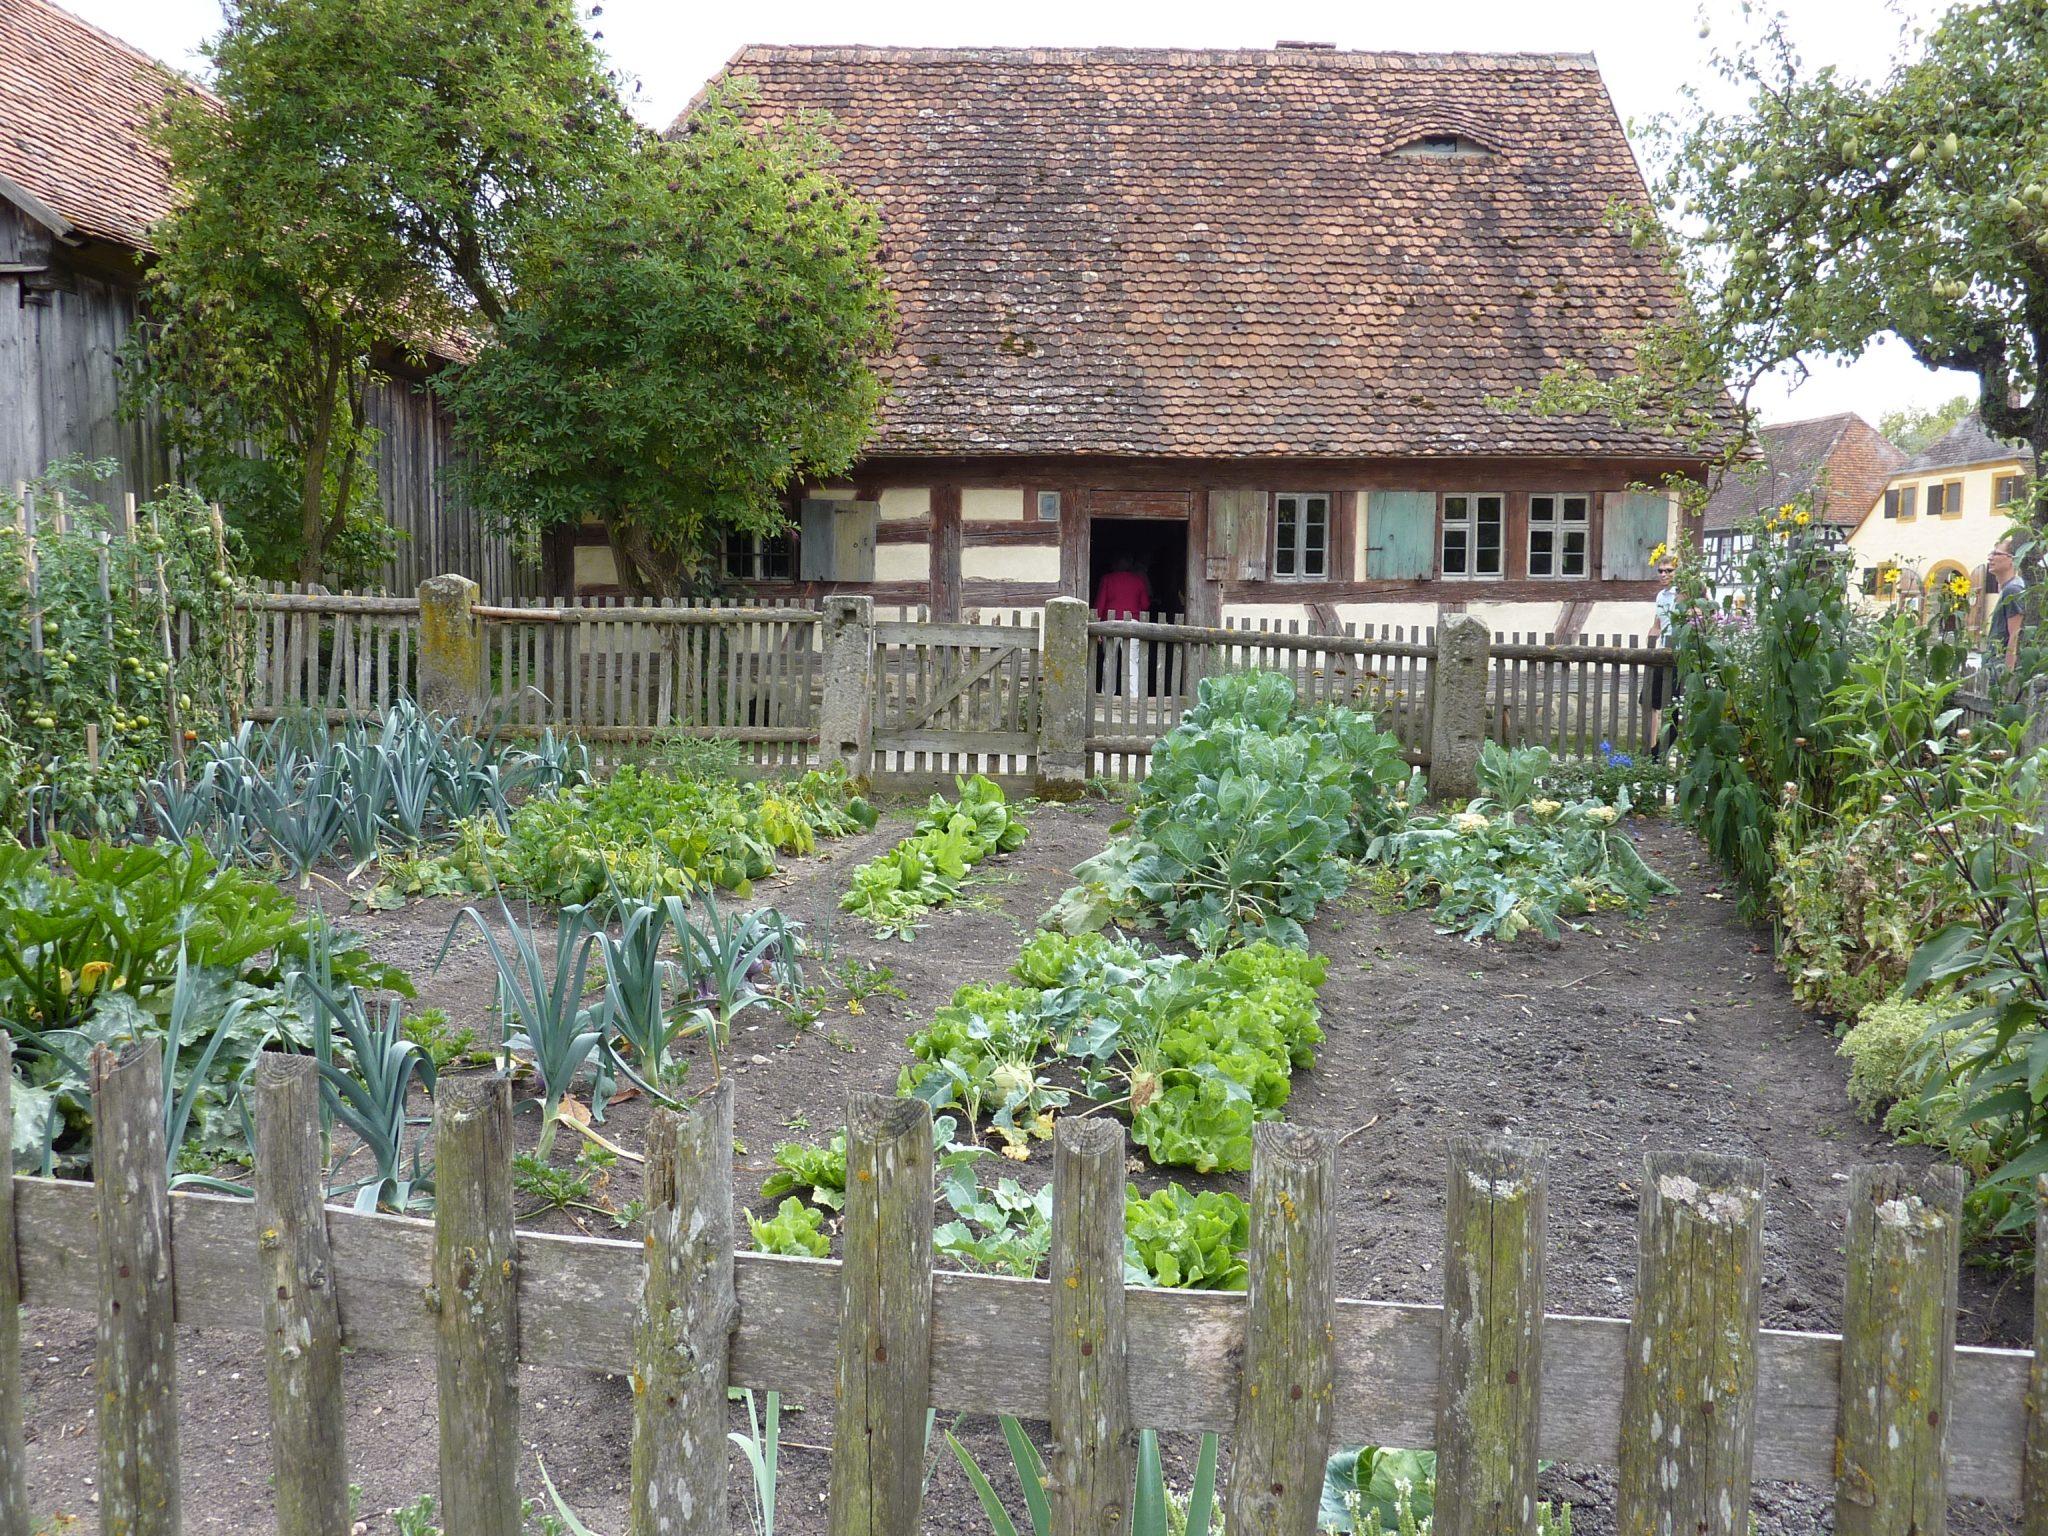 Backyard Garden for juicing